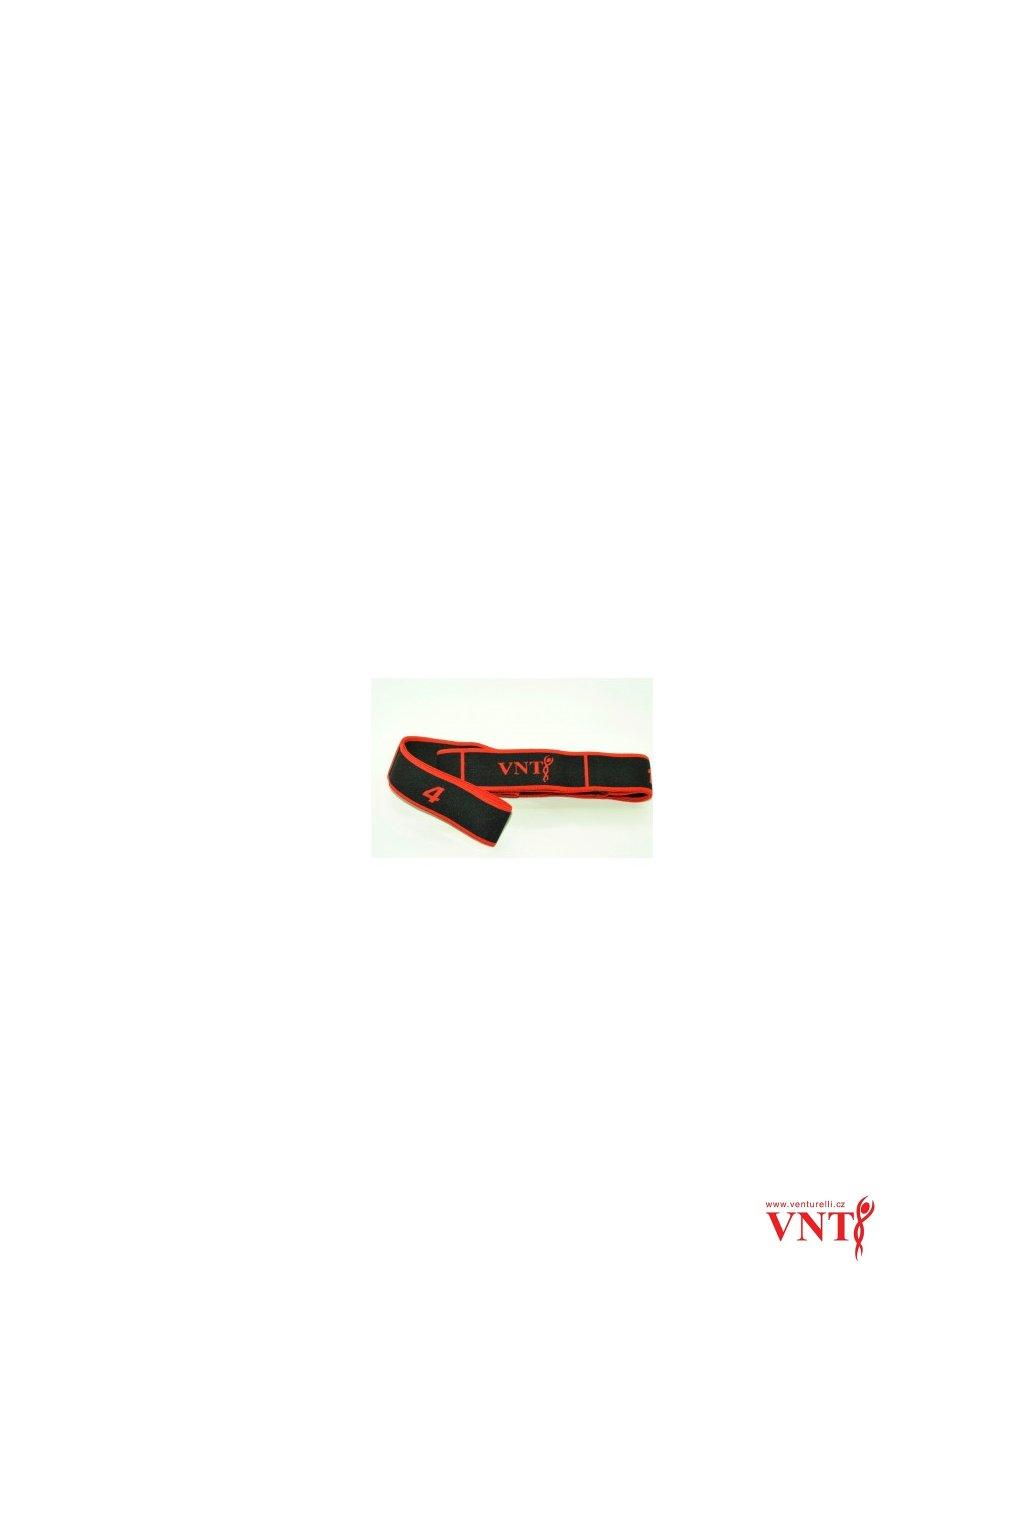 vnt elastic band 8 position 282x346